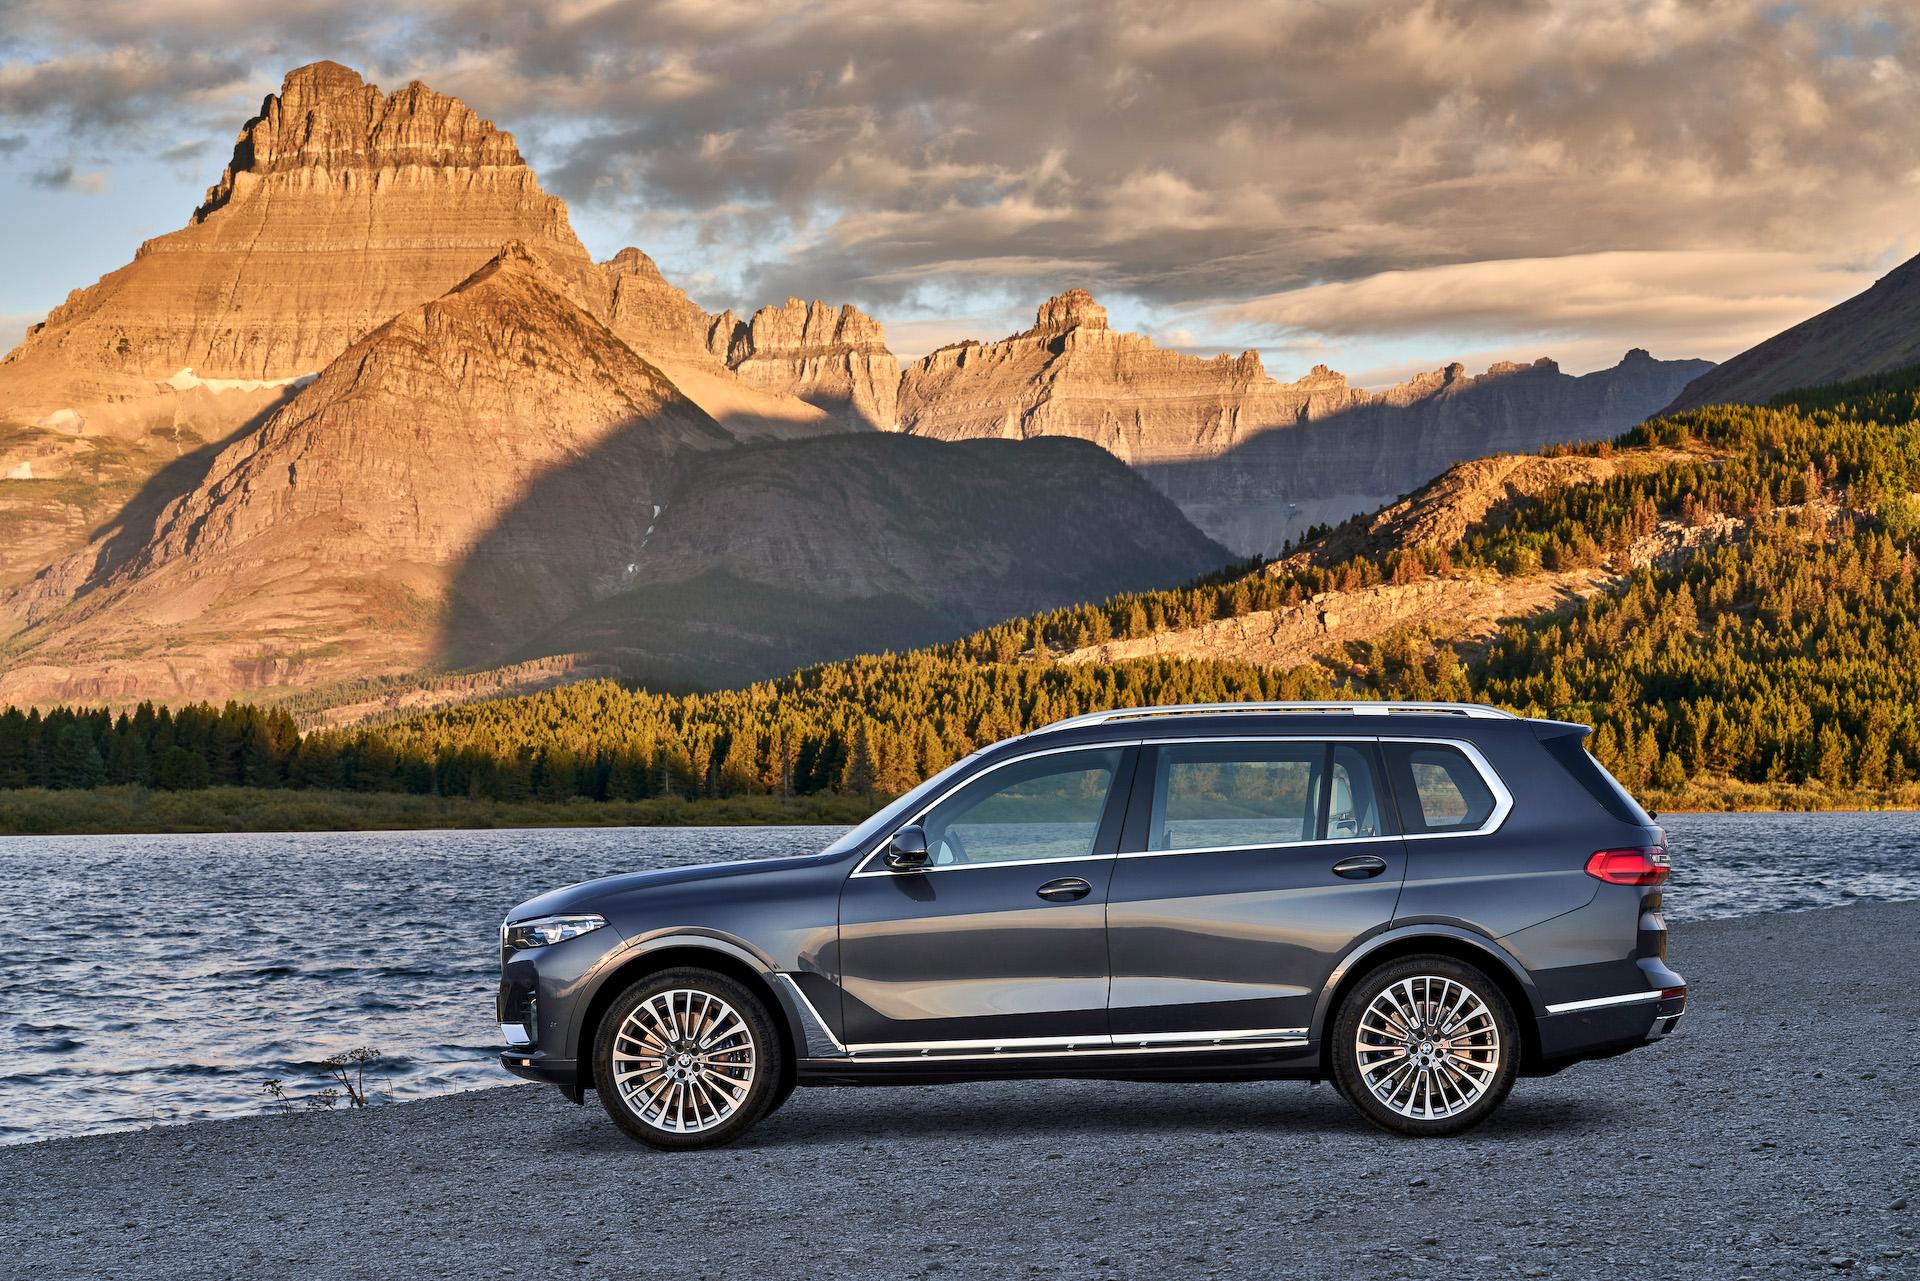 BMW、3列シート仕様の新型SAV「X7」公開